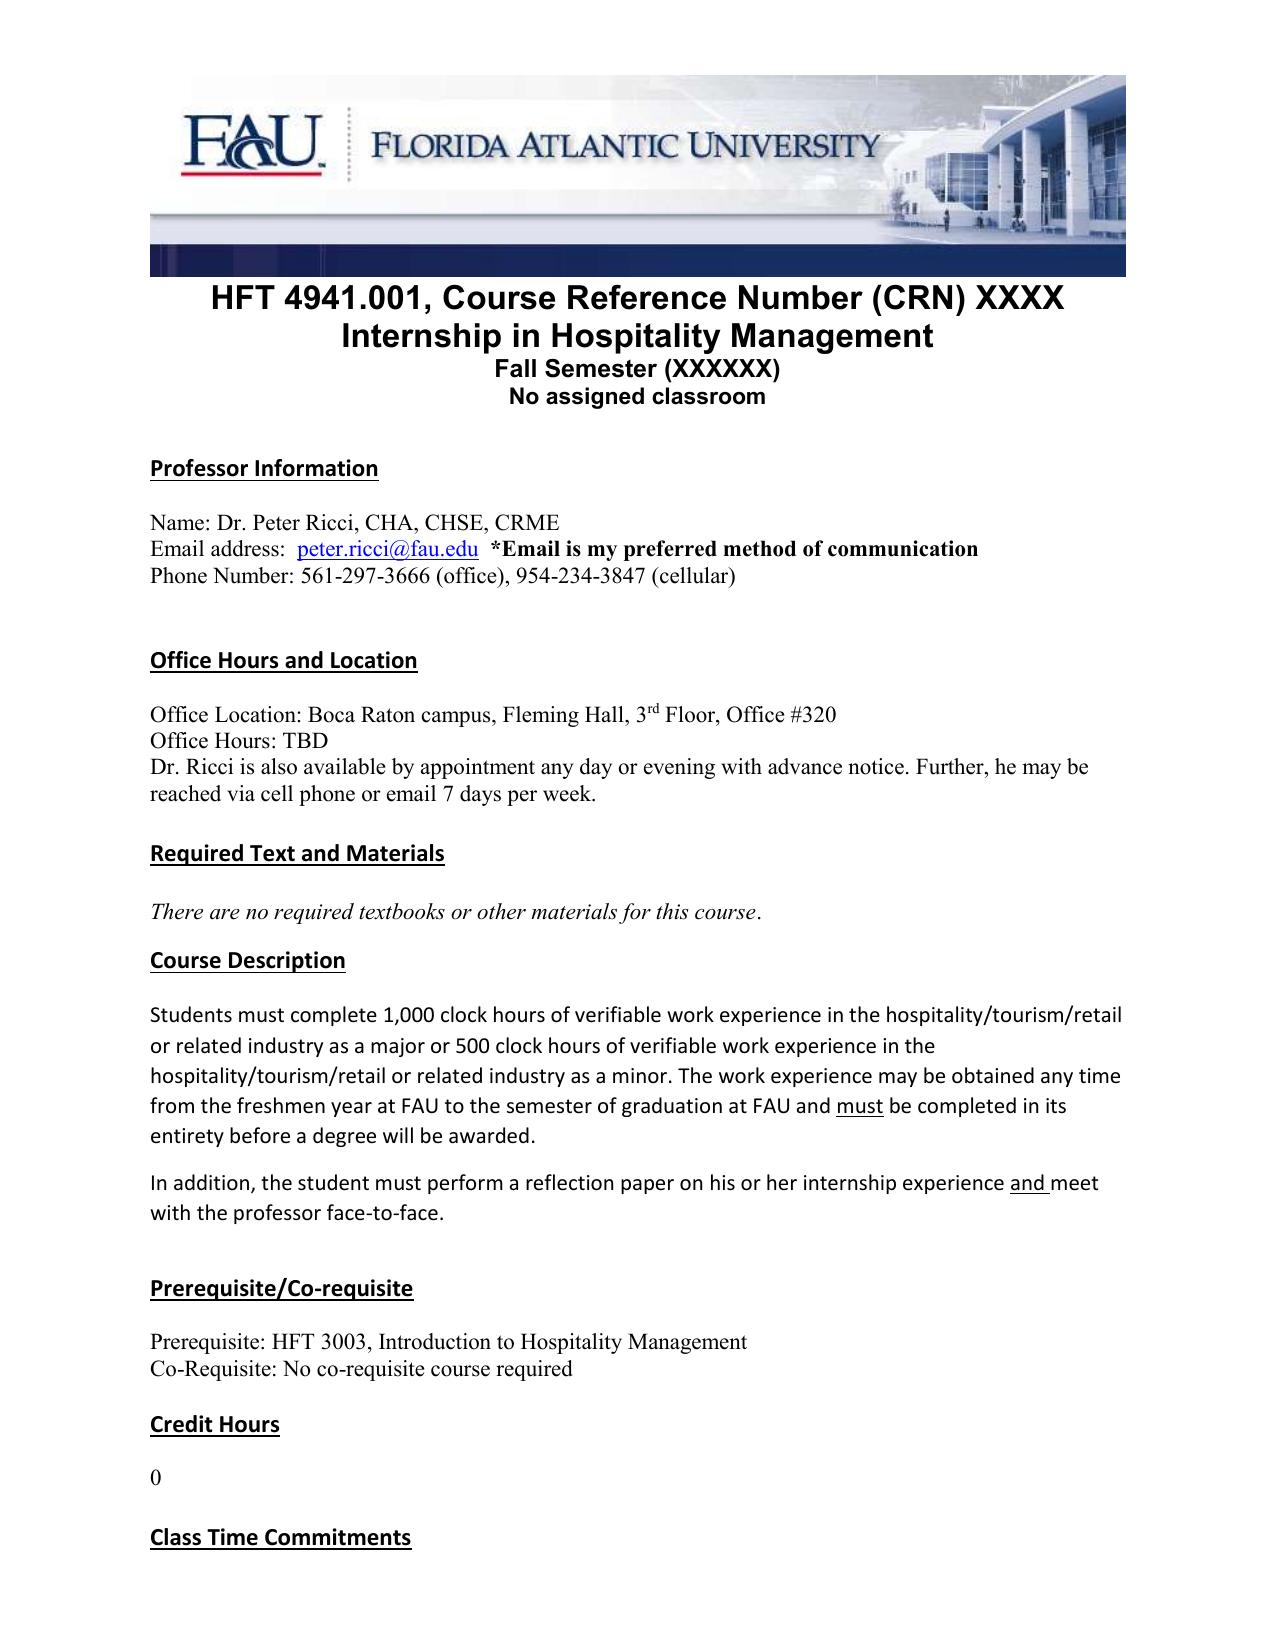 HFT 4941 001, Course Reference Number (CRN) XXXX Internship in